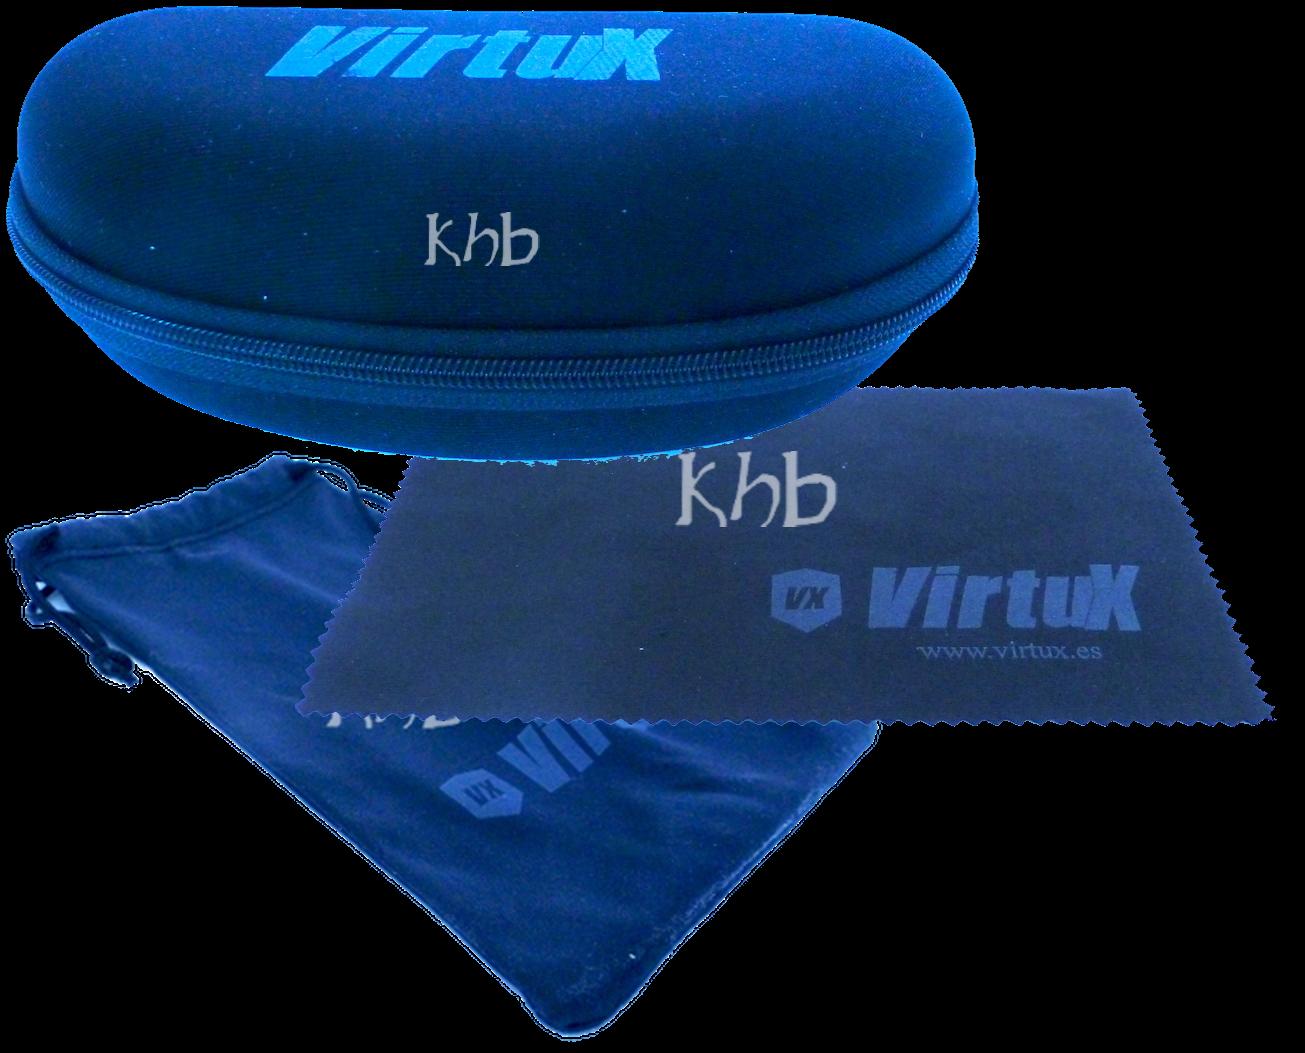 Virtux